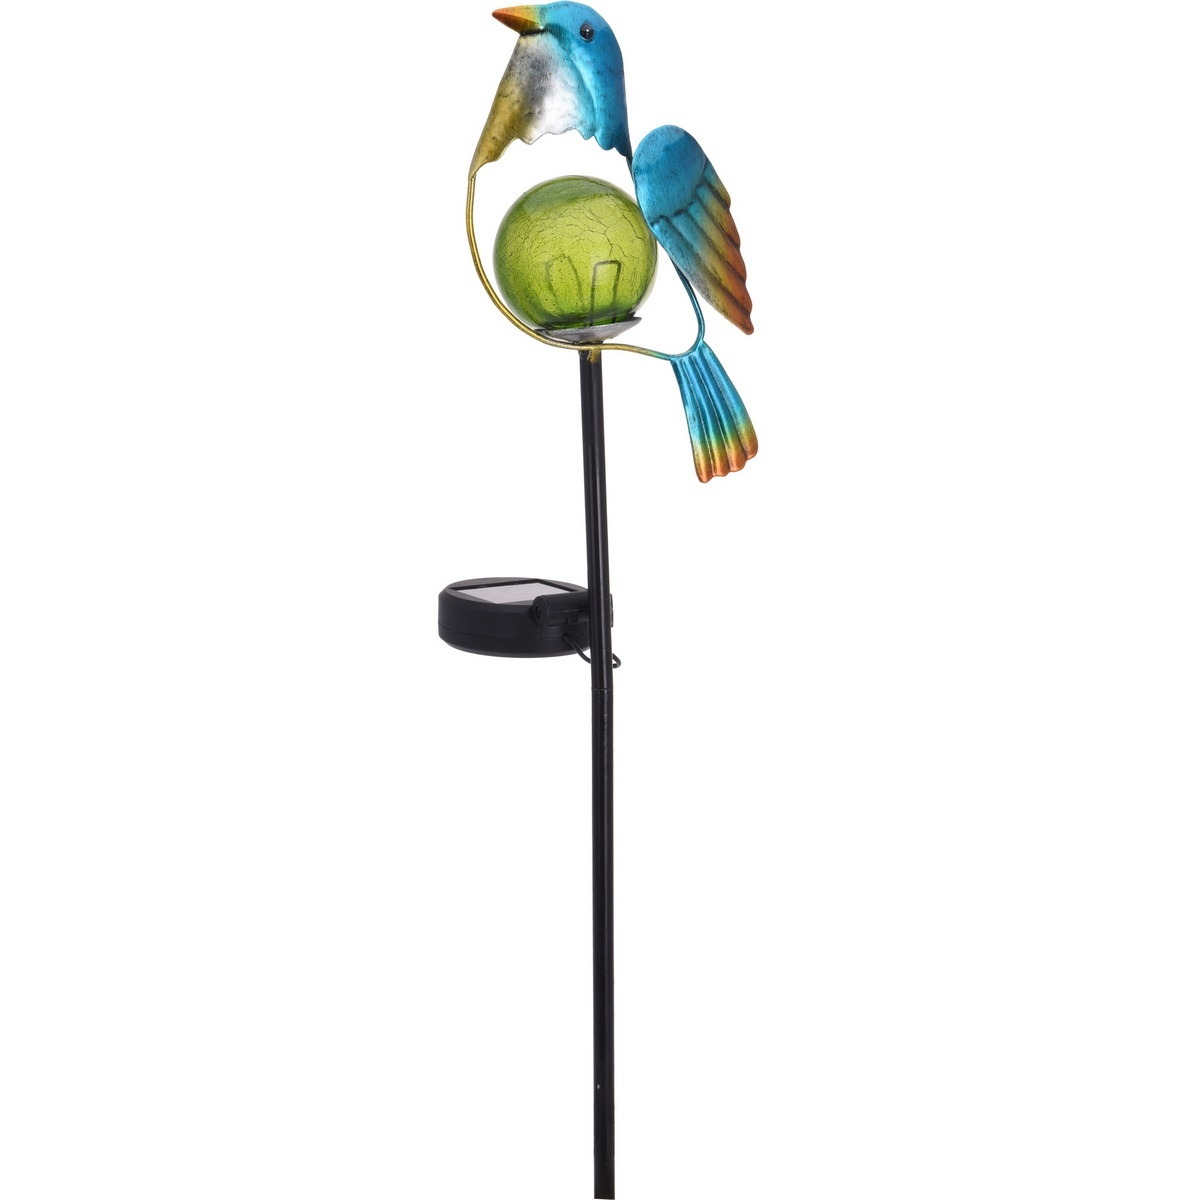 Solární lampa Bird modrá, 13 x 6 x 52 cm